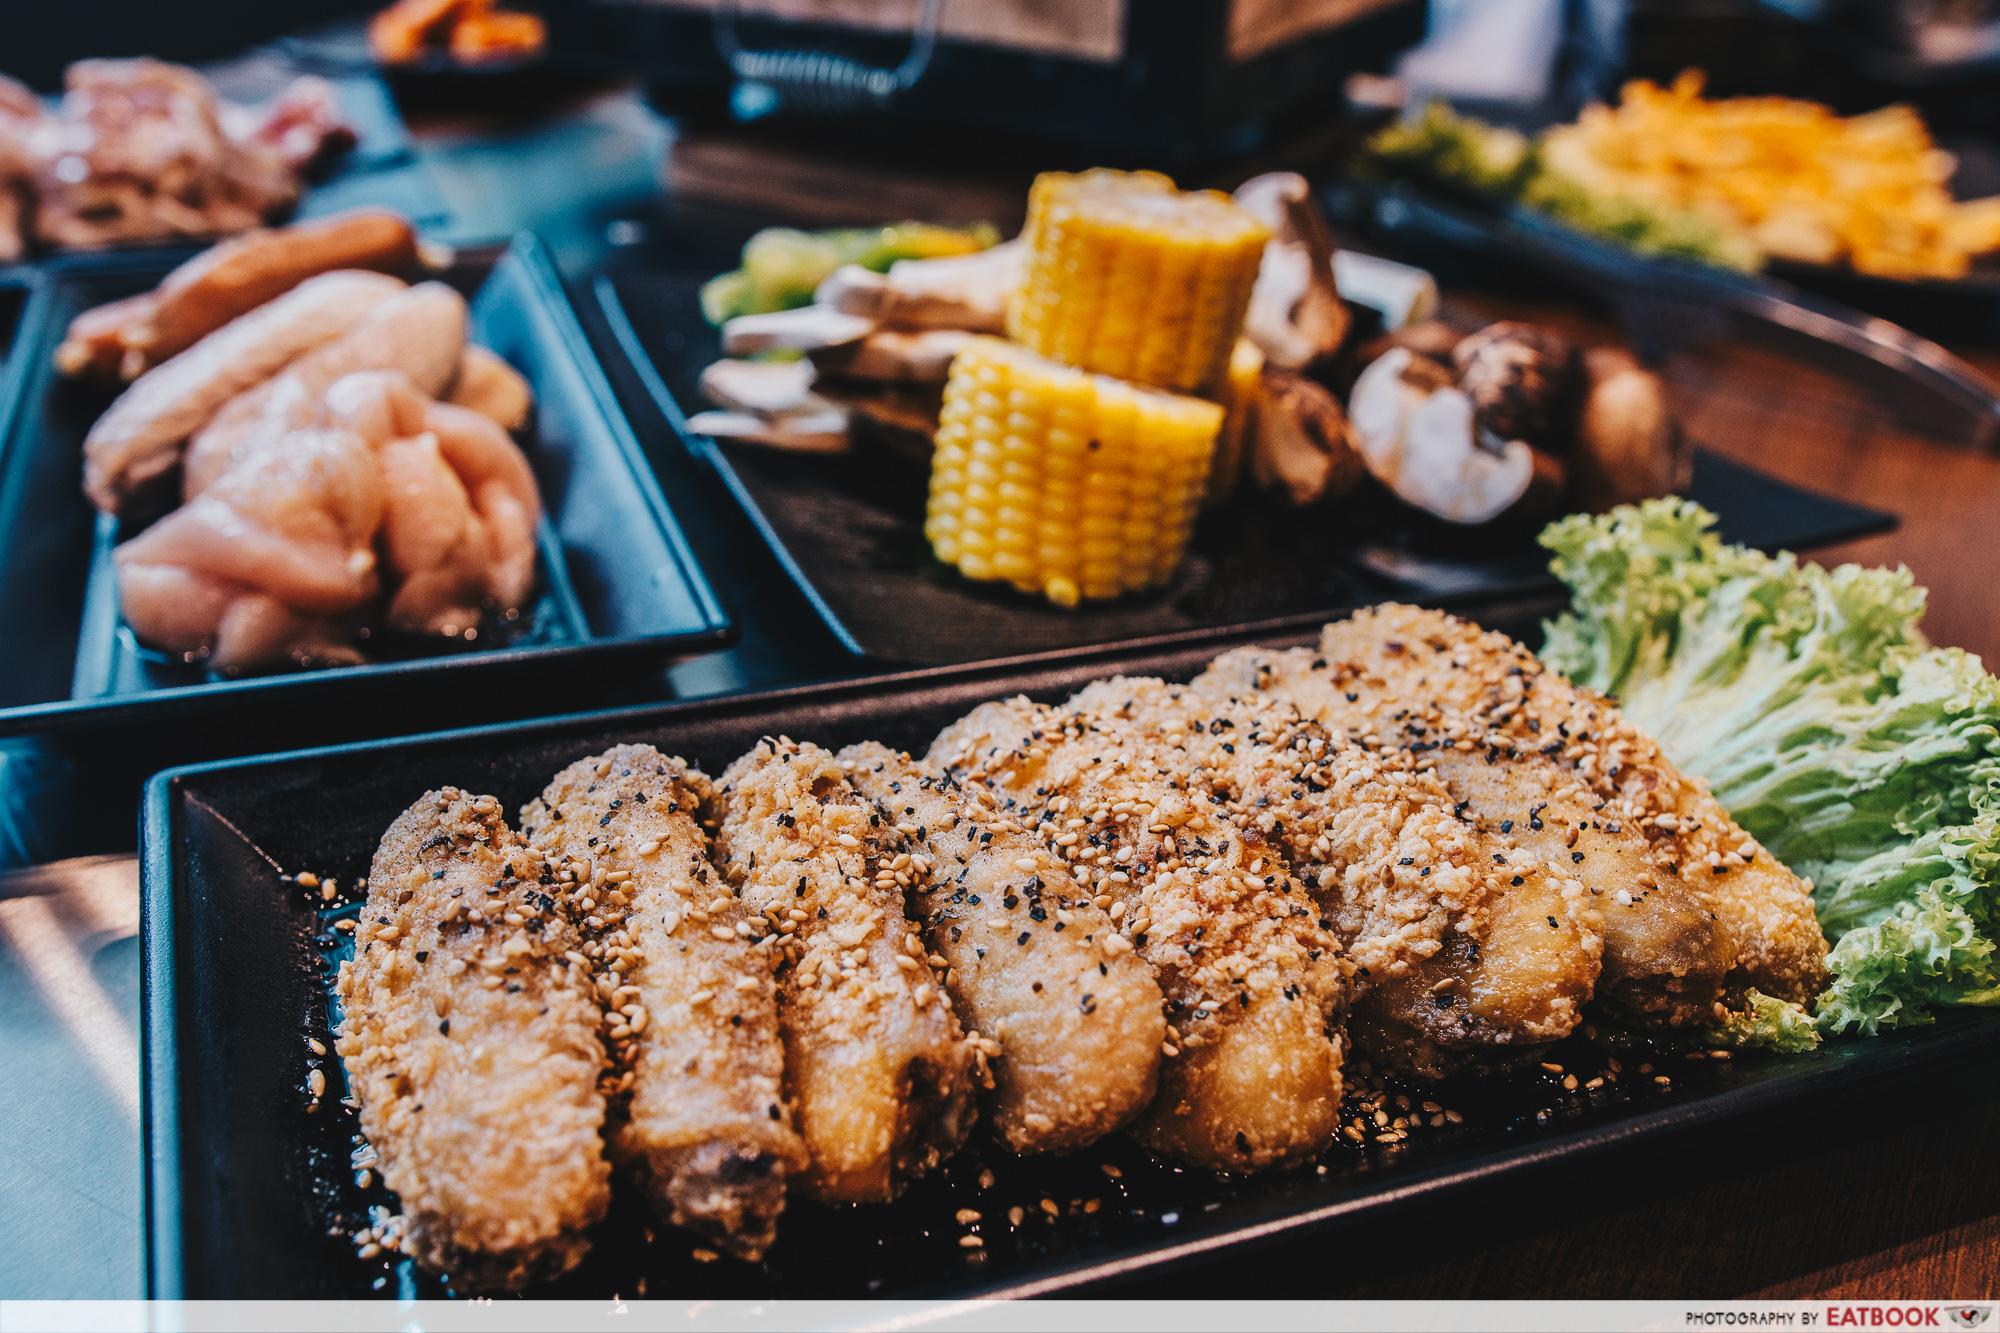 Yakiniku Ohji - Deep-Fried Chicken Wings